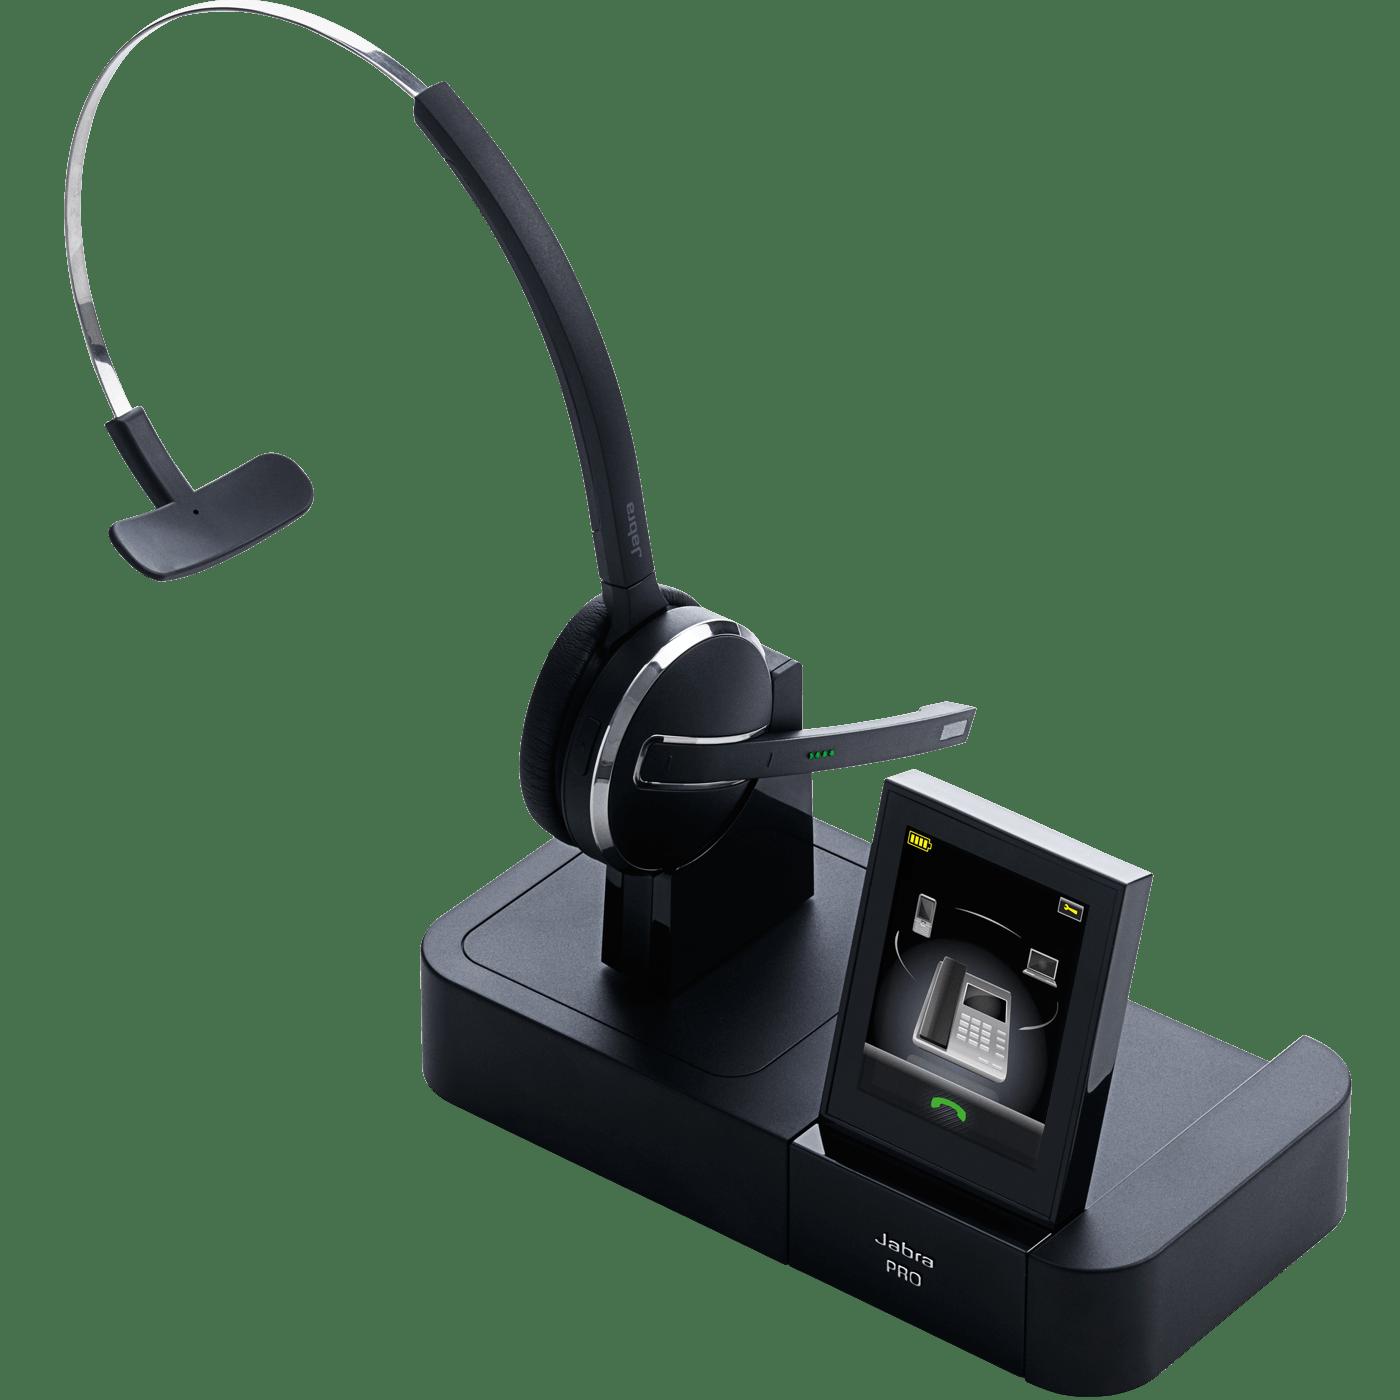 Jabra Pro 9470 | Support